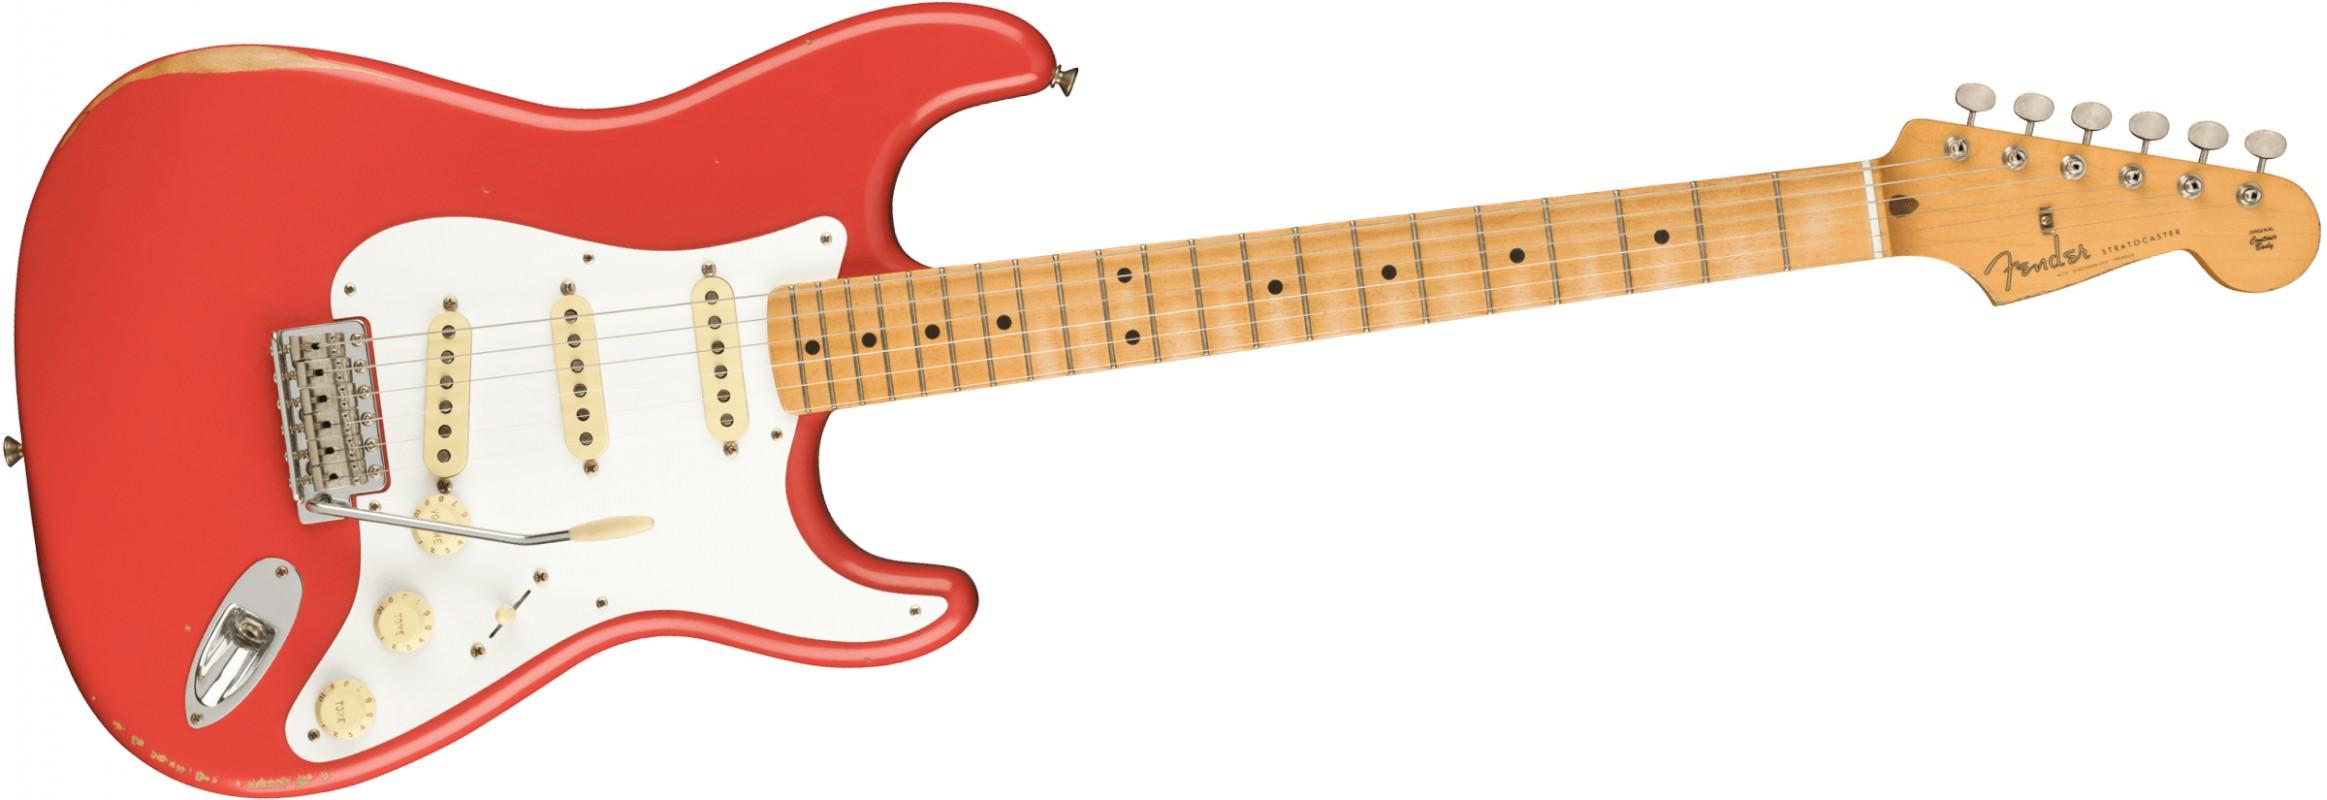 FENDER-Vintera-Road-Worn-50s-Stratocaster-MN-Fiesta-Red-0149972340-sku-24196